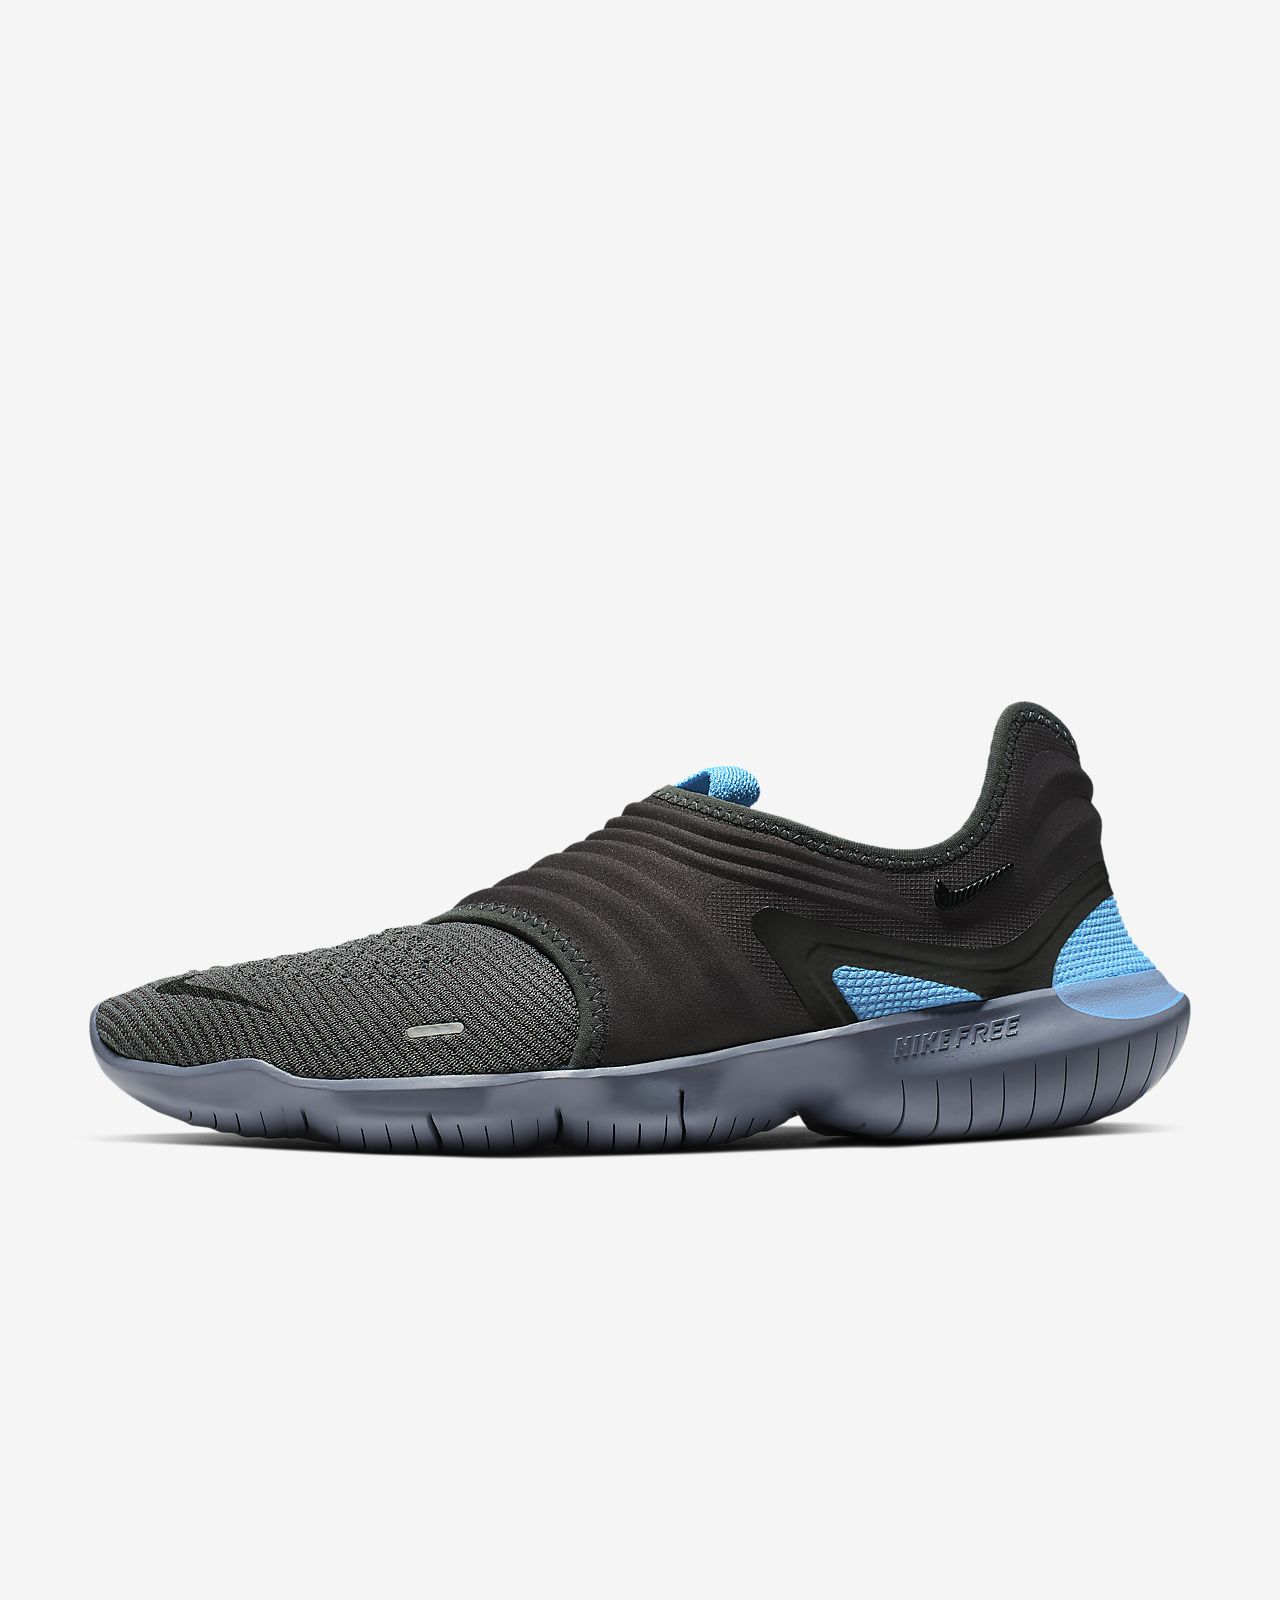 Nike Free RN Flyknit 5. 0 Black Men's Running Training Shoes